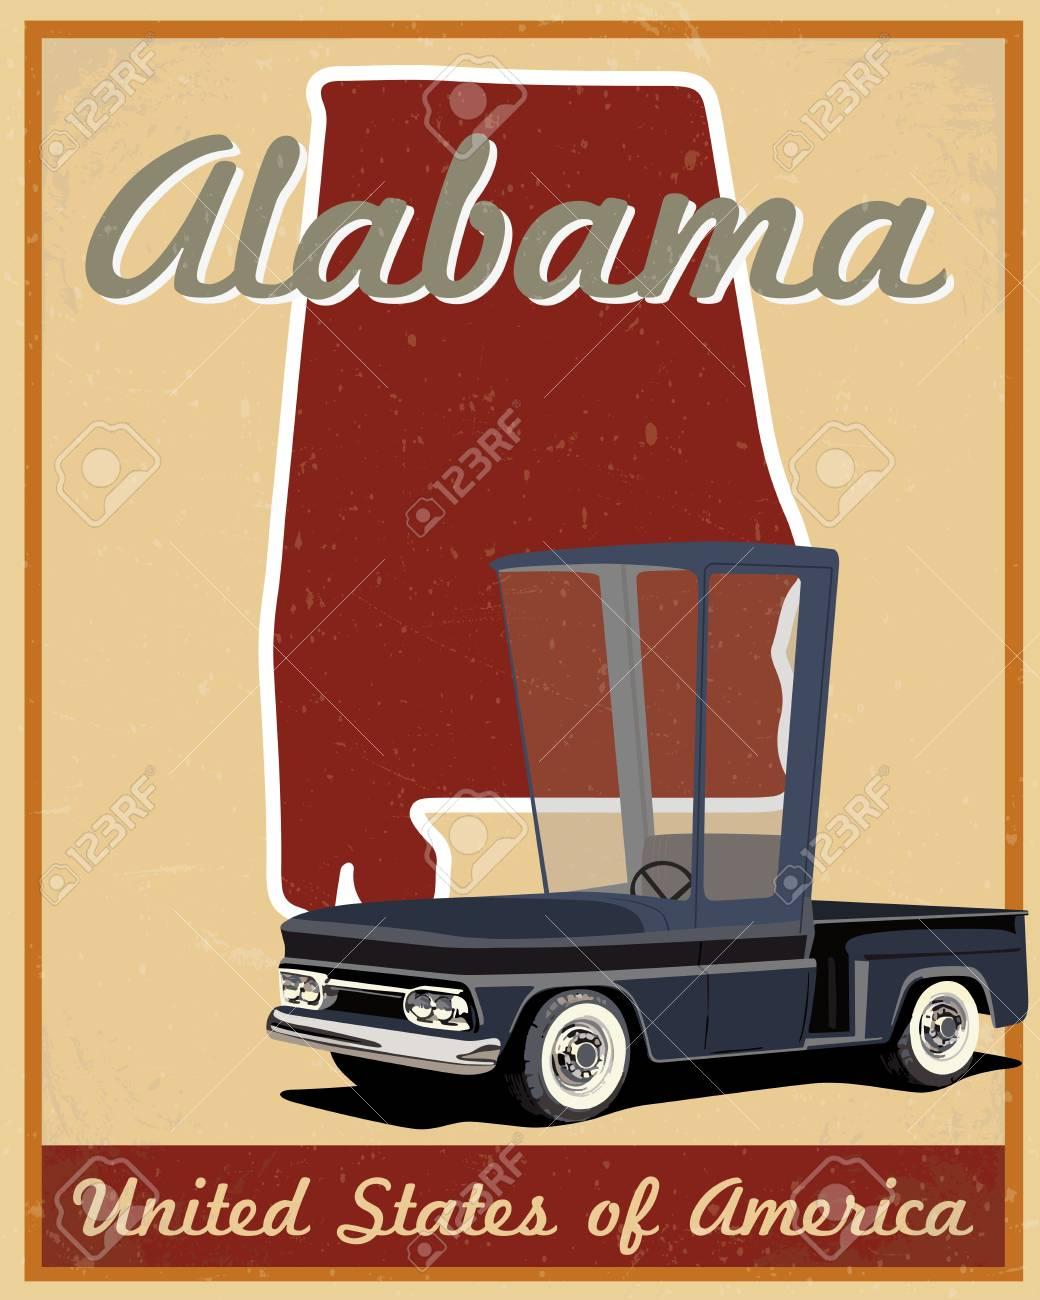 alabama road trip vintage poster.